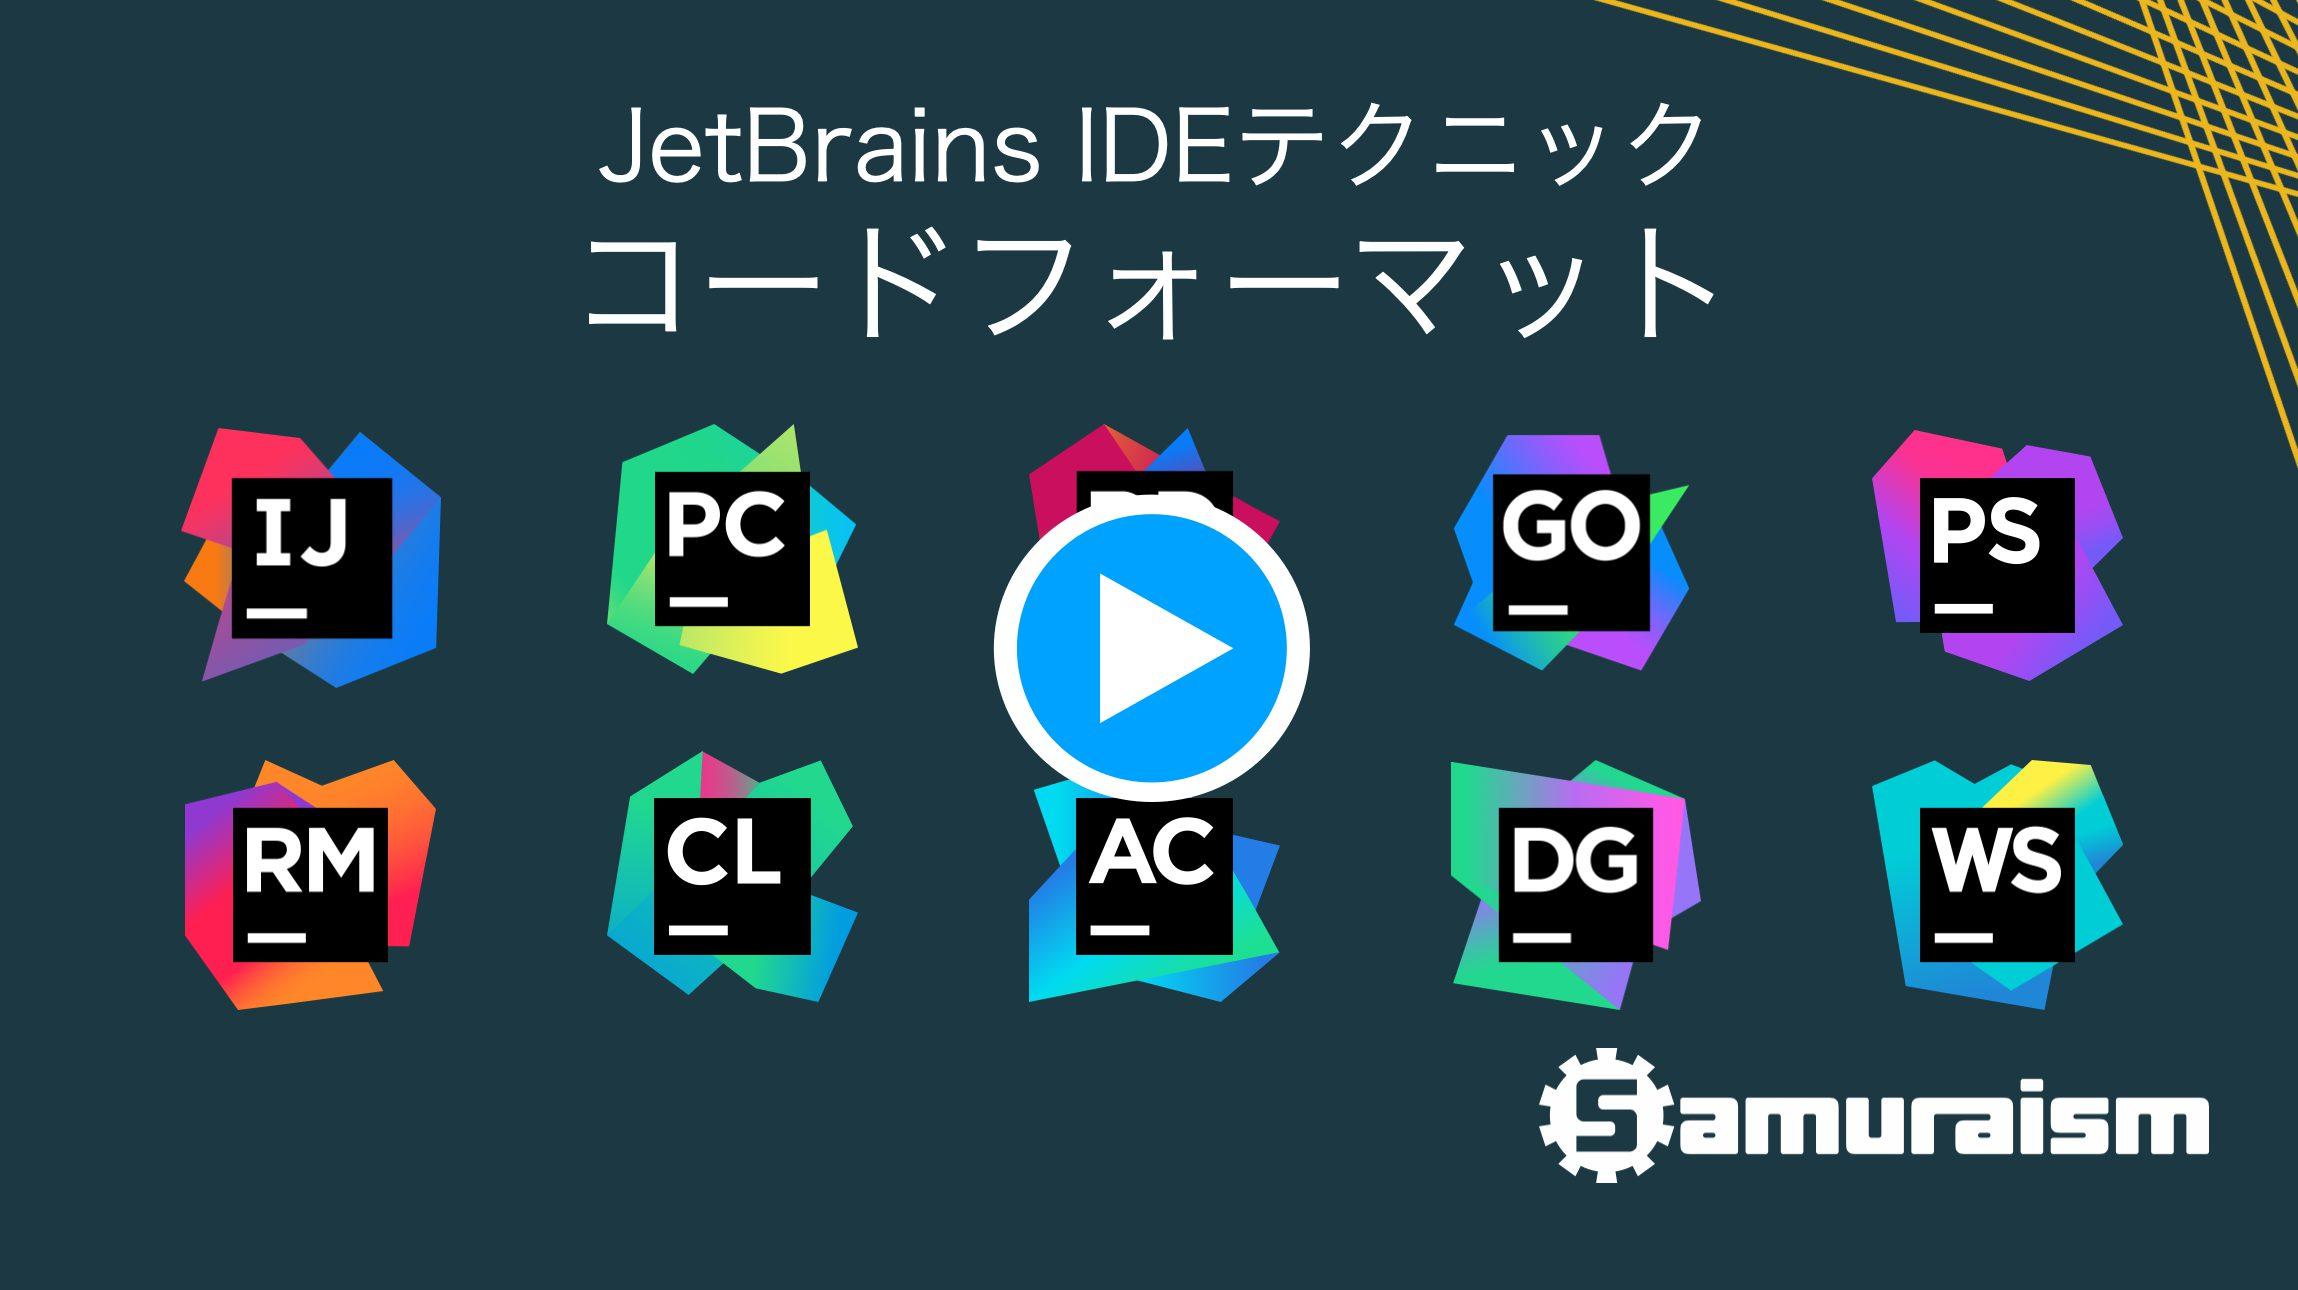 #JetBrainsIDEテクニック – コードフォーマット